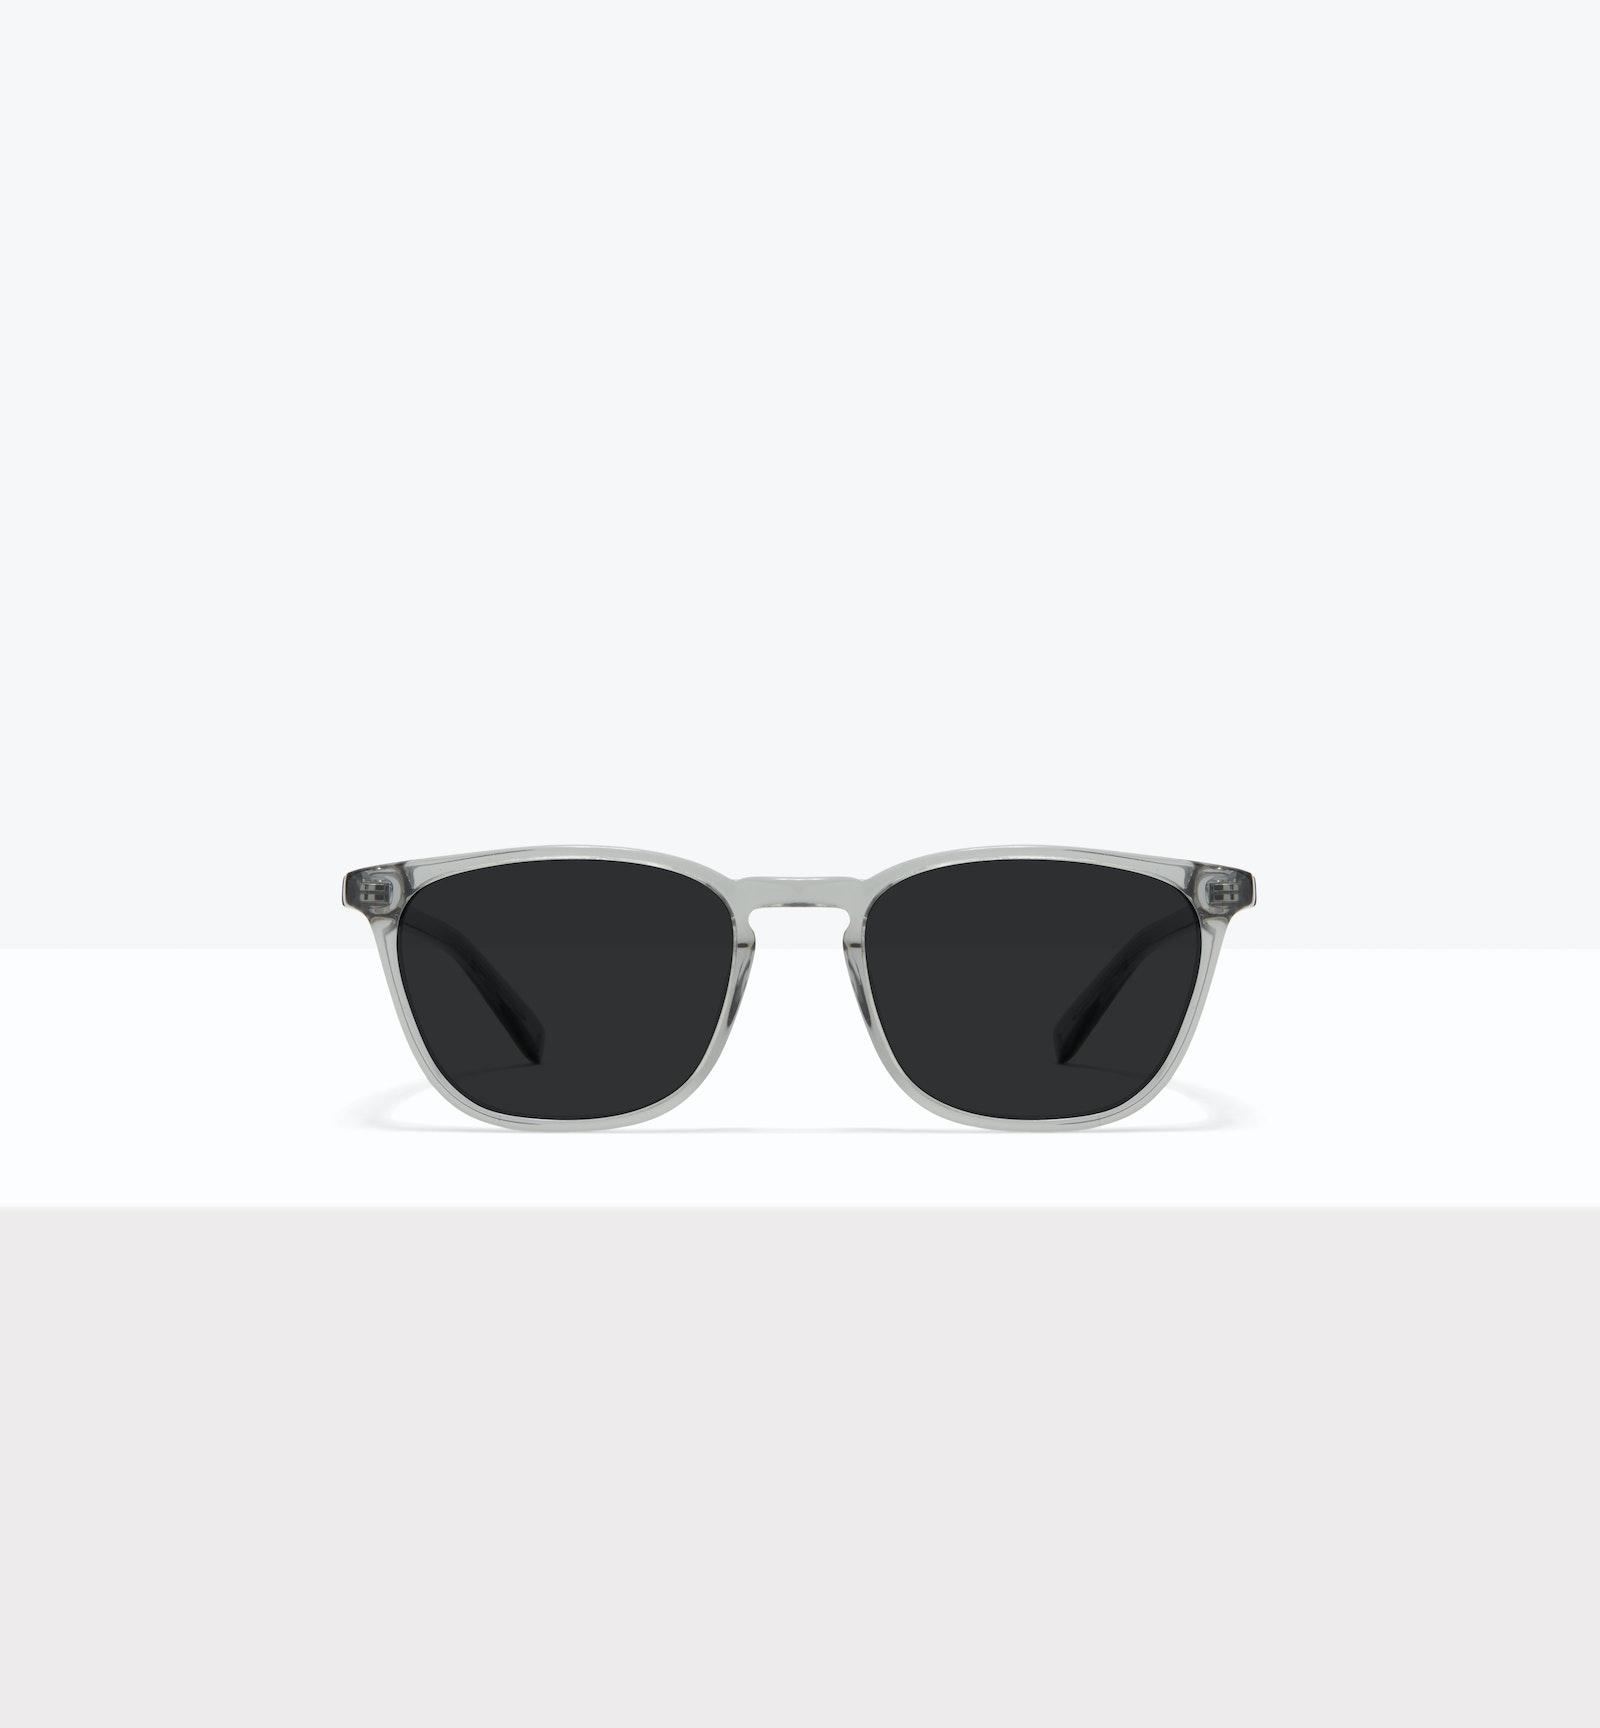 Affordable Fashion Glasses Square Sunglasses Men Louise M Storm